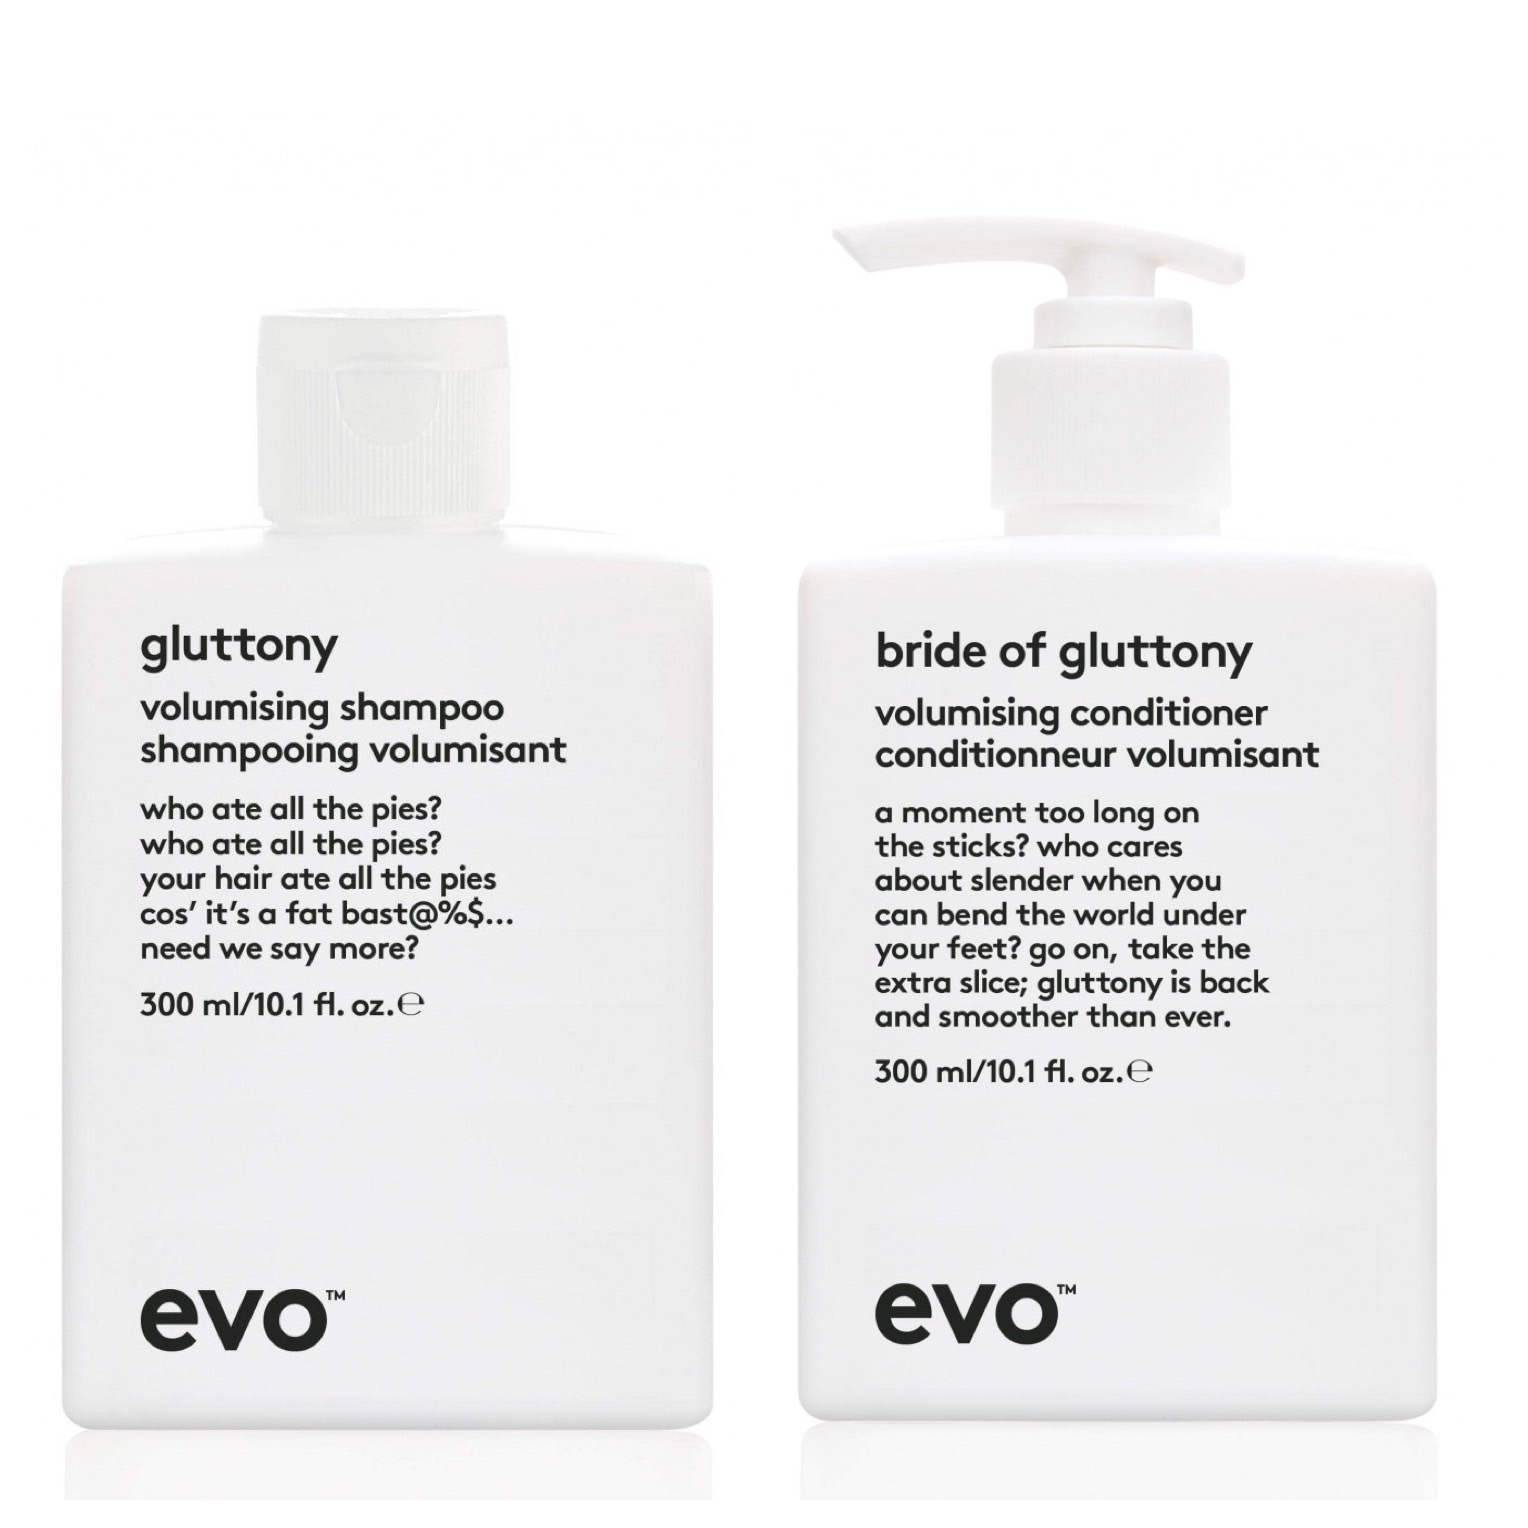 evo Hair Gluttony Volumising Shampoo 300ml + Conditioner 300ml